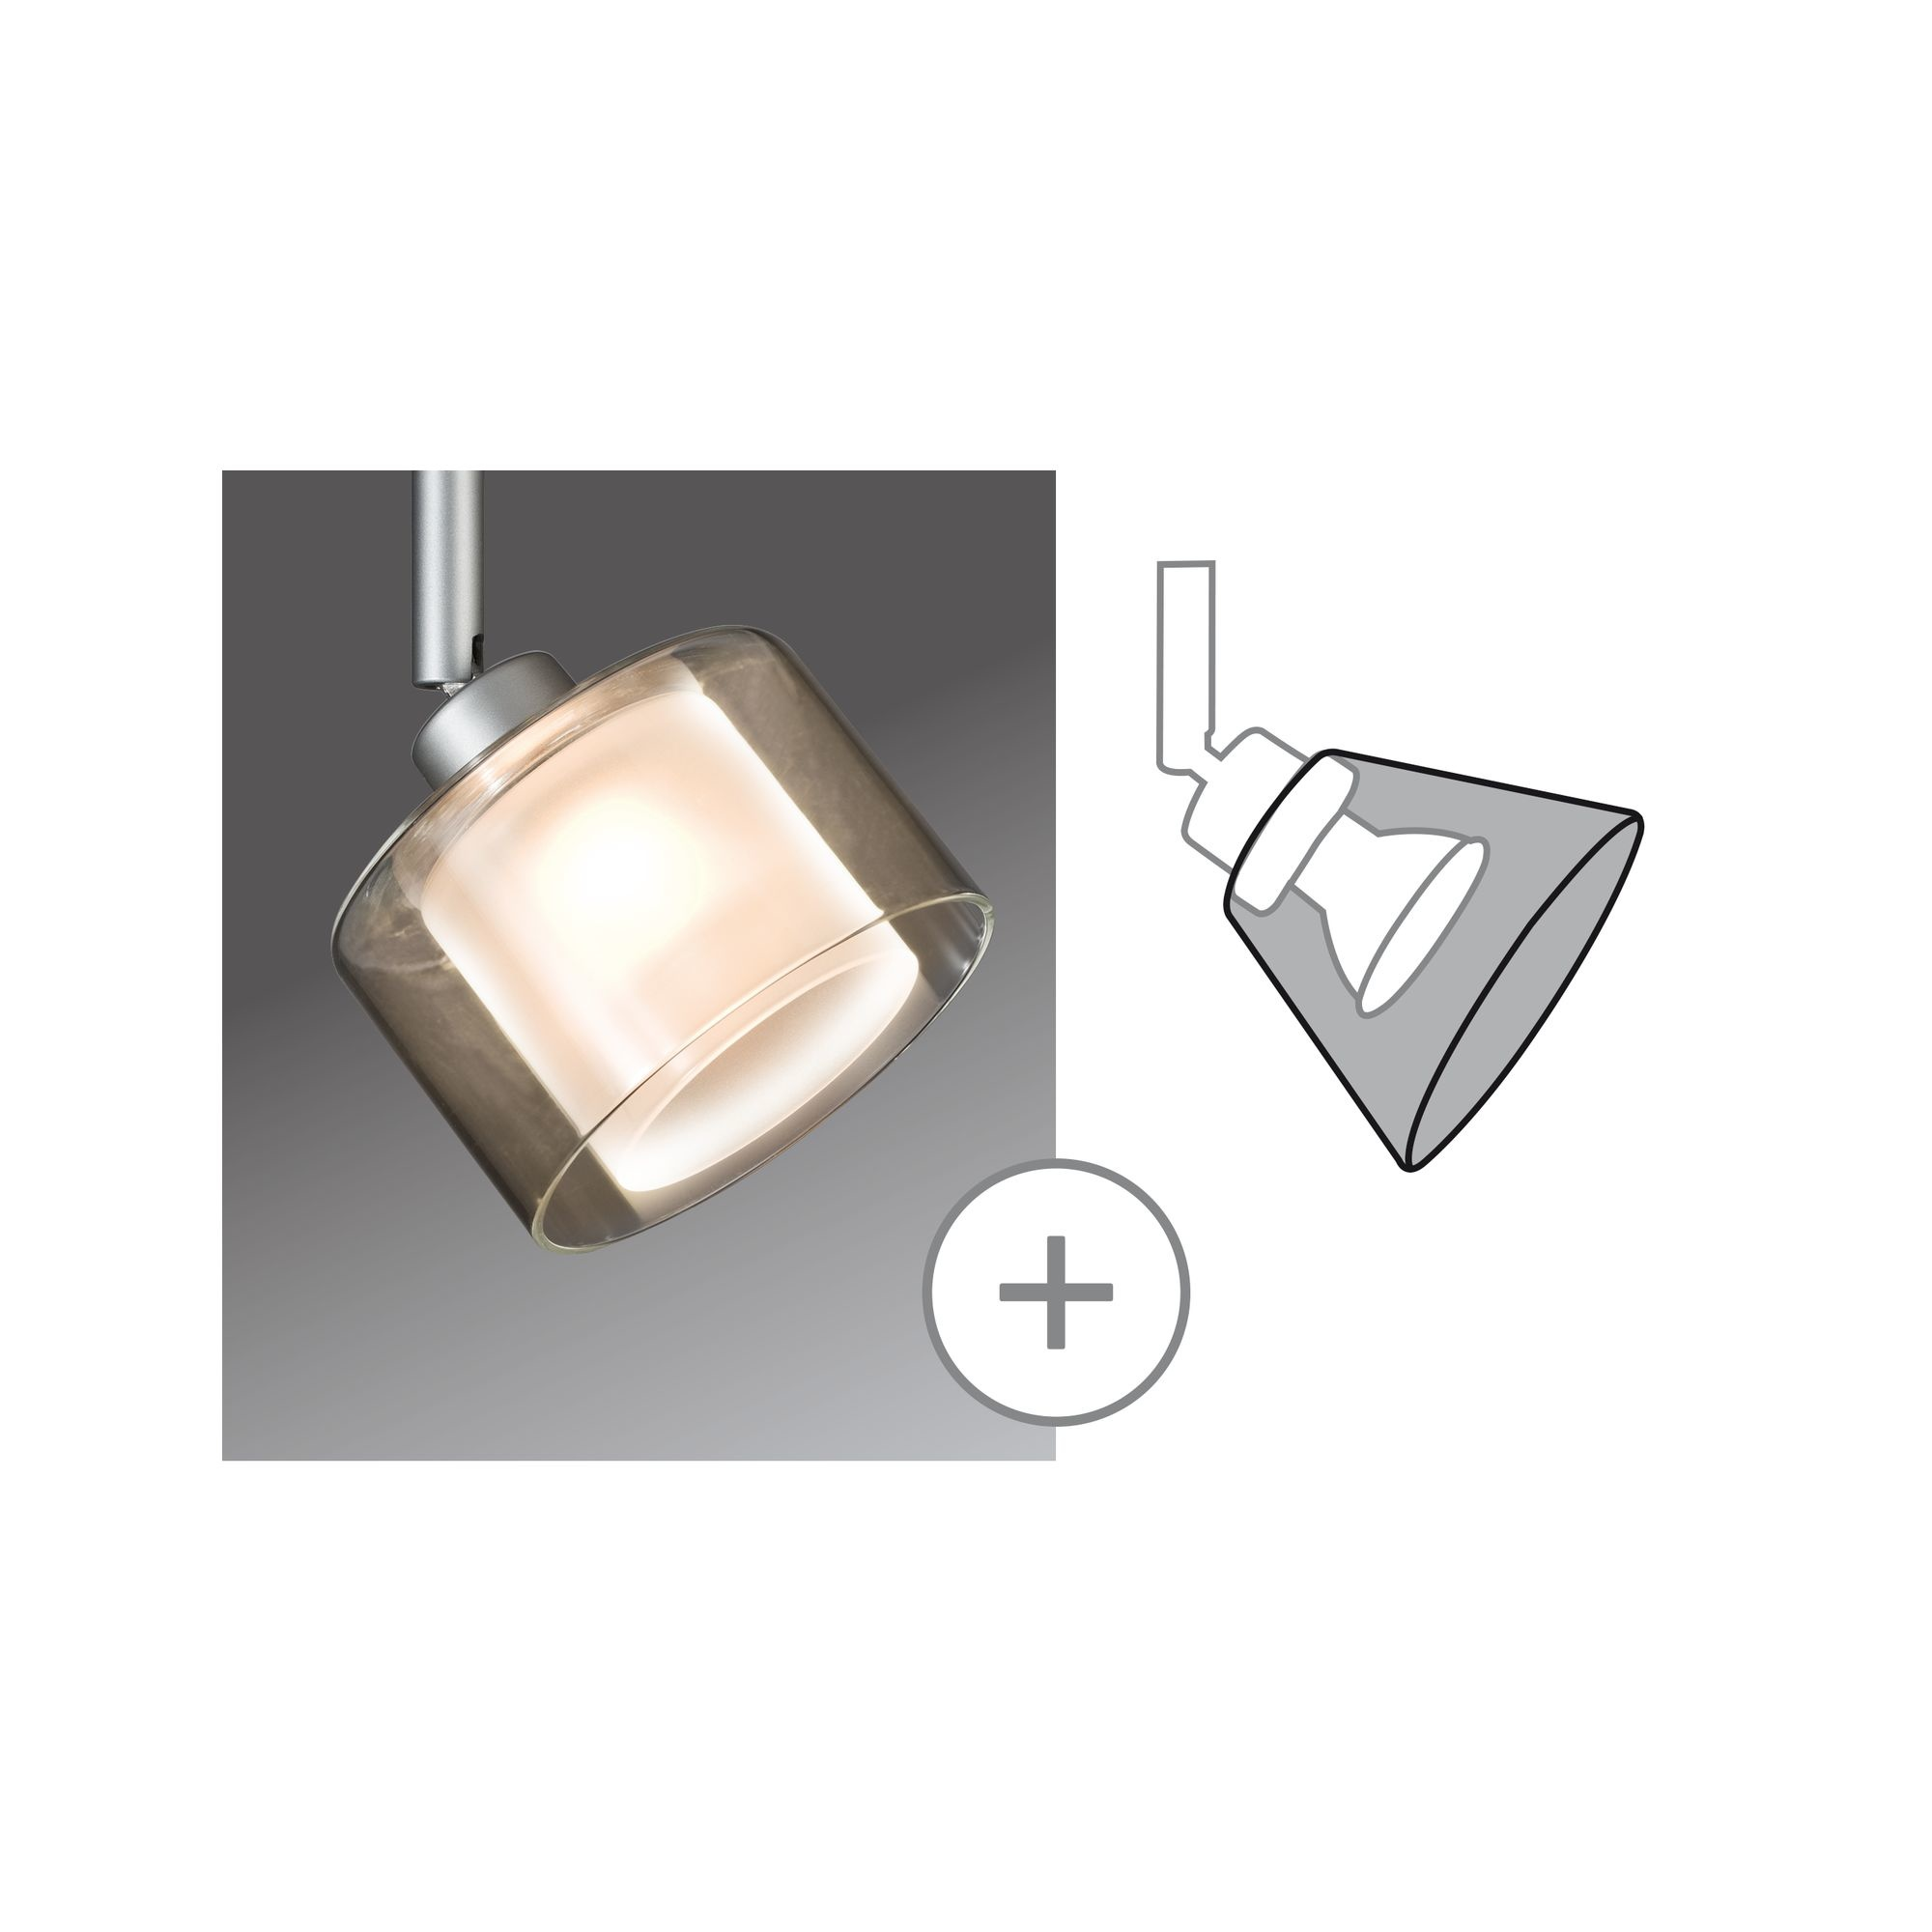 Paulmann DecoSystems Deco Schirm Twice Klar, Opak, Glas